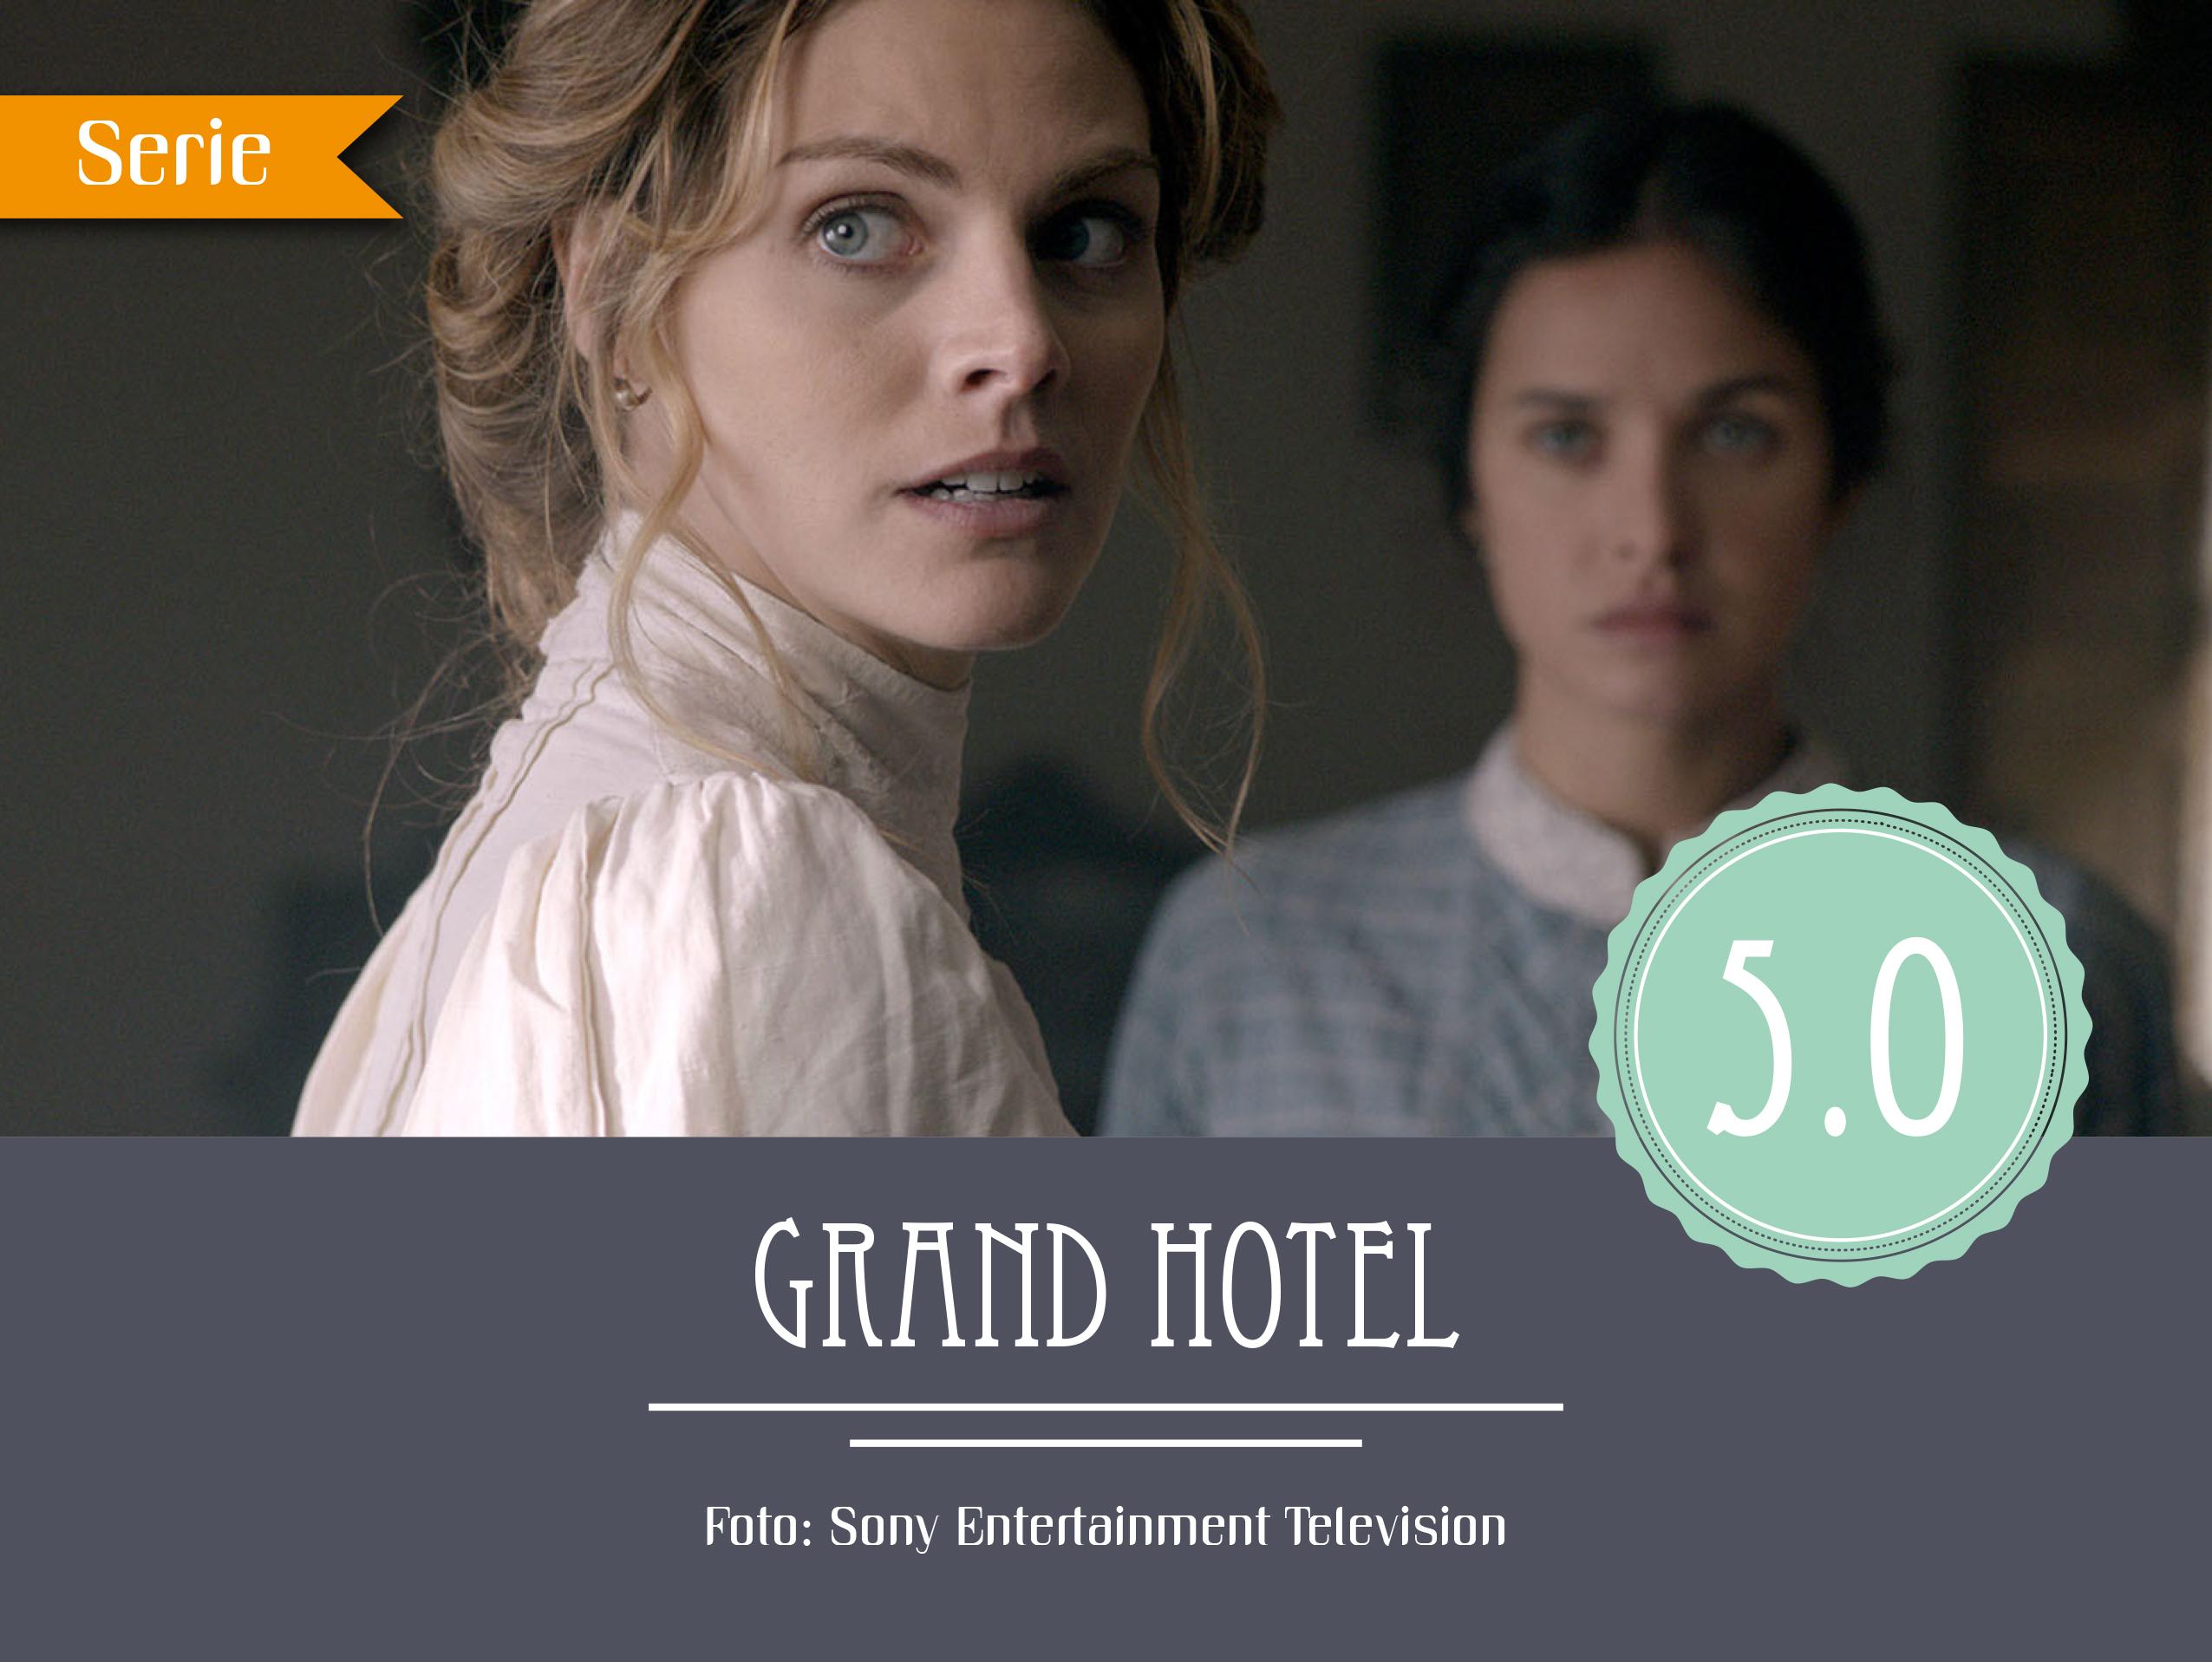 Serie Grand Hotel Staffel 2 Gina Dieu Armstark